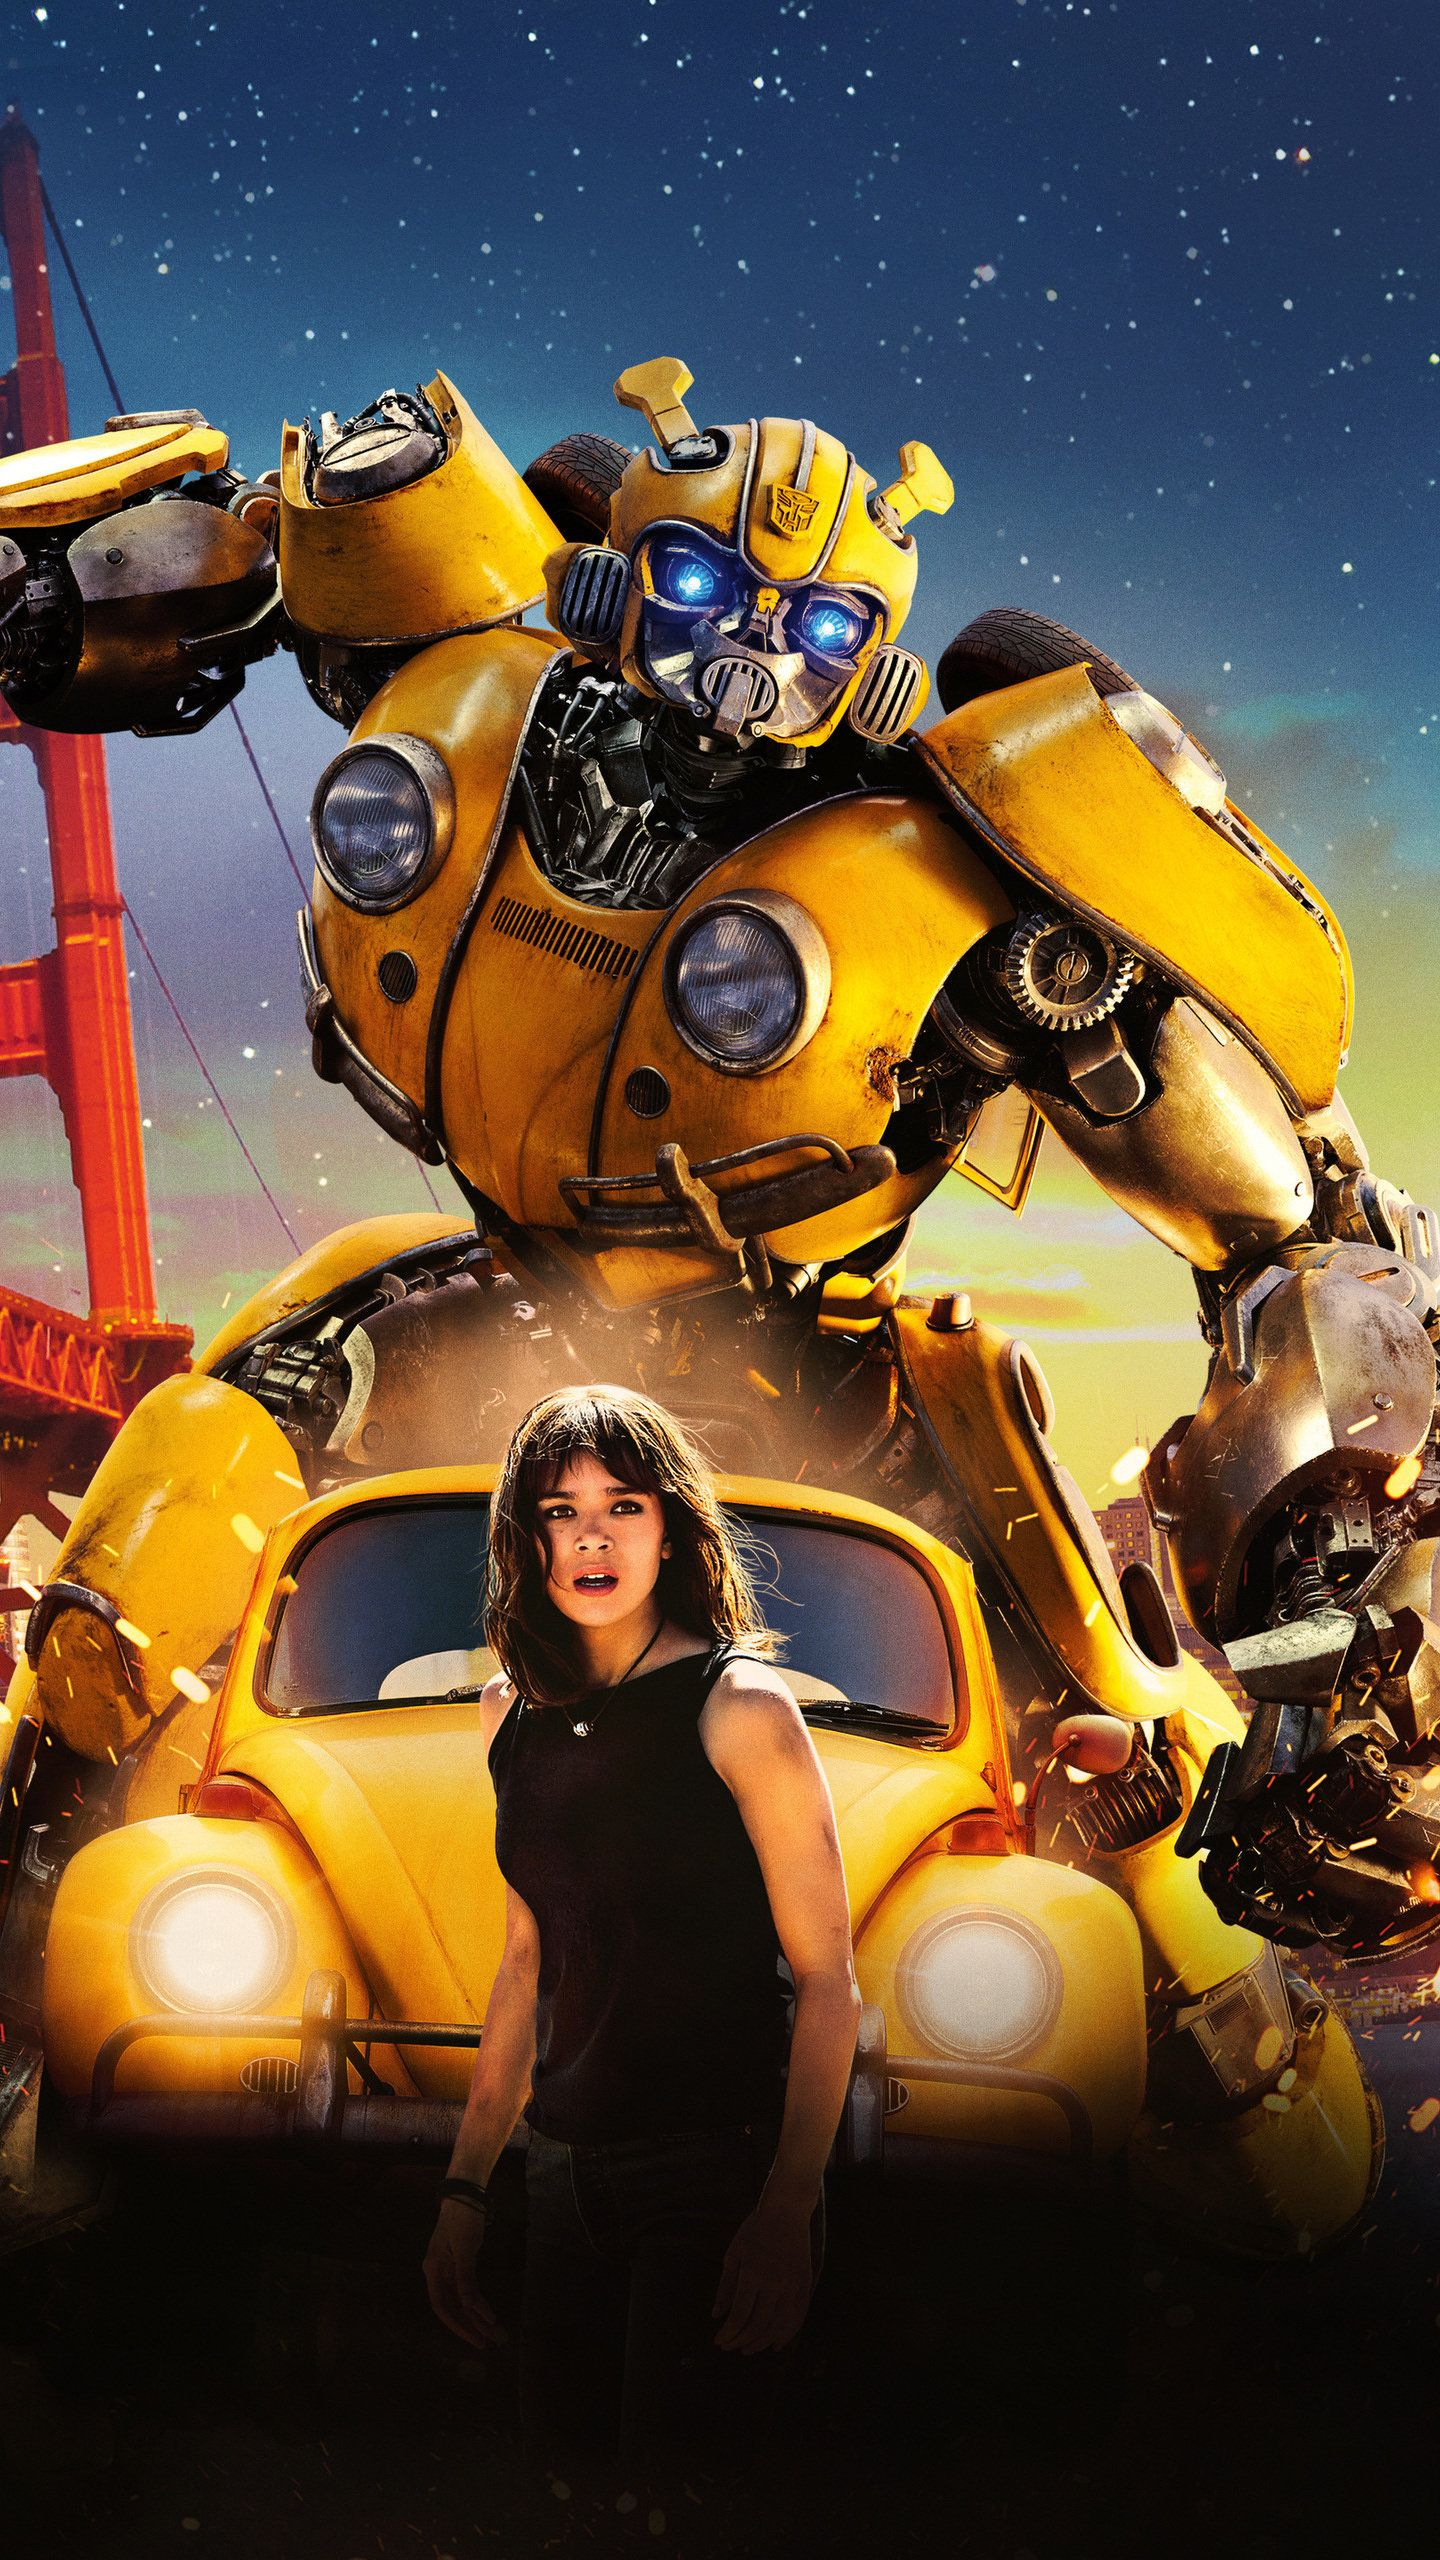 Bumblebee Movie 8k Hd Wallpaper In 2020 Transformers Transformers Cars Movie Wallpapers